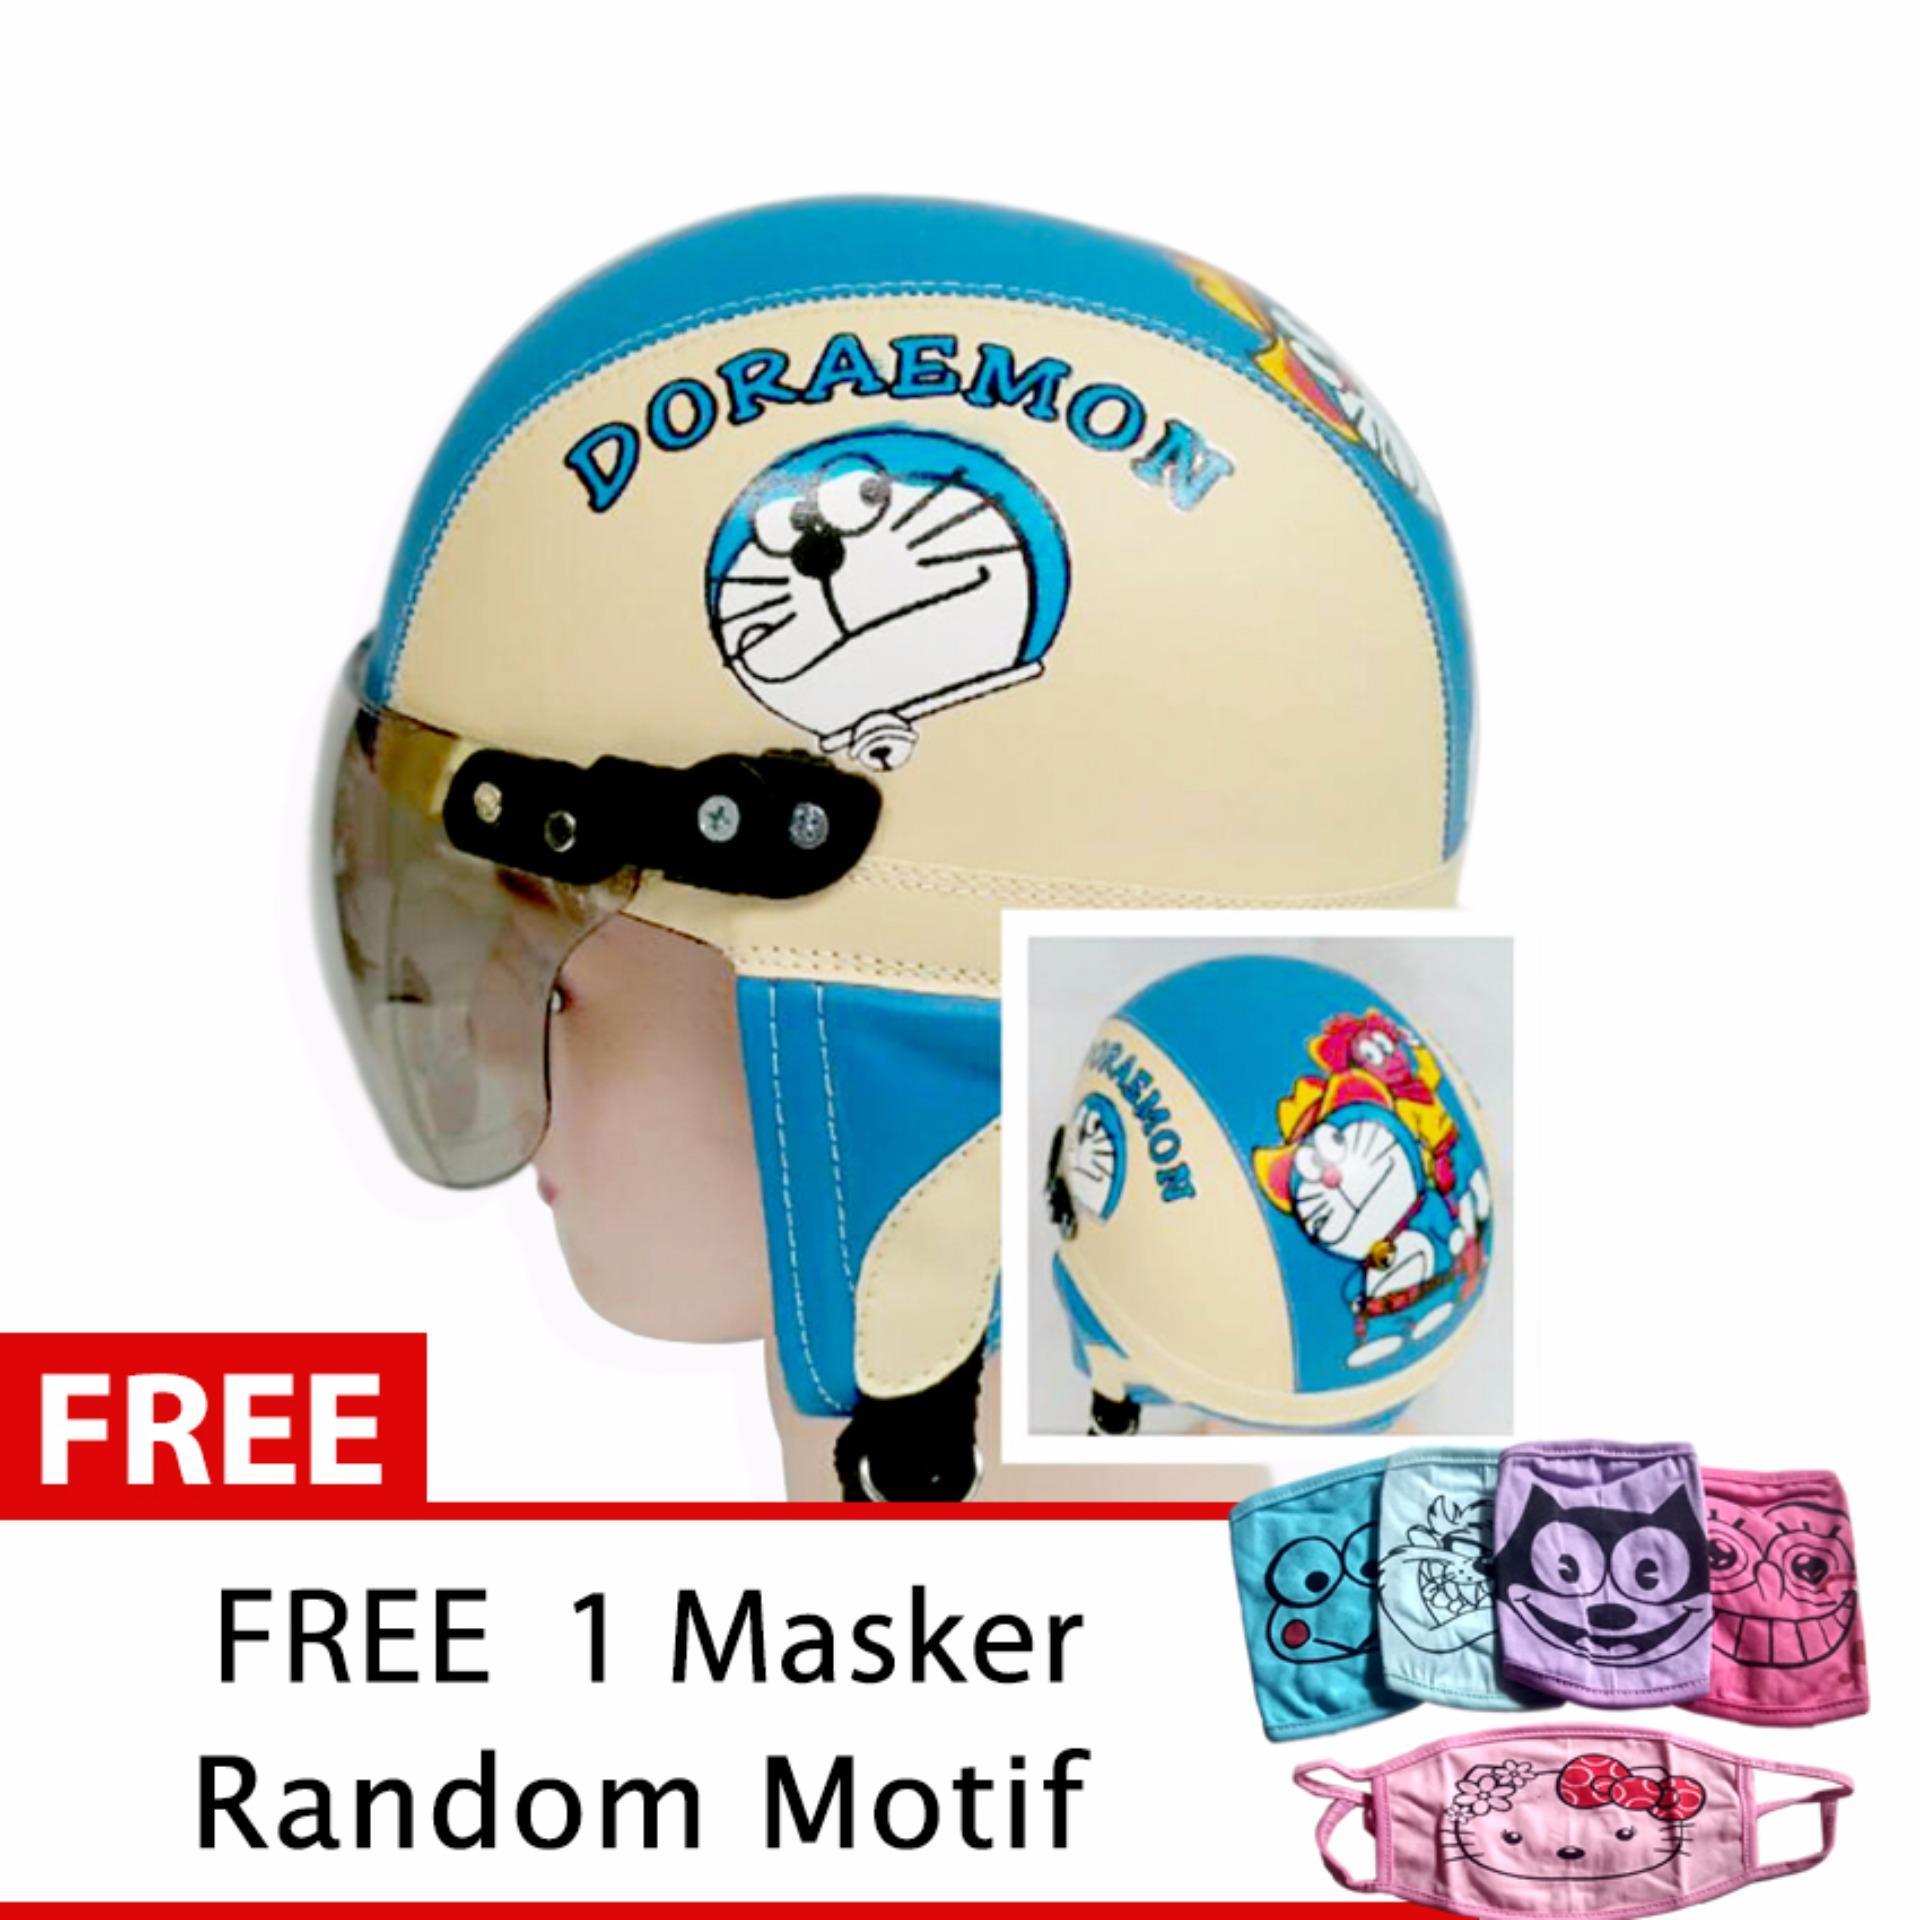 Harga Helm Anak Retro Usia 1 4 Tahun Motif Doraemon Cream Biru Free Masker Jbx Helmets Online